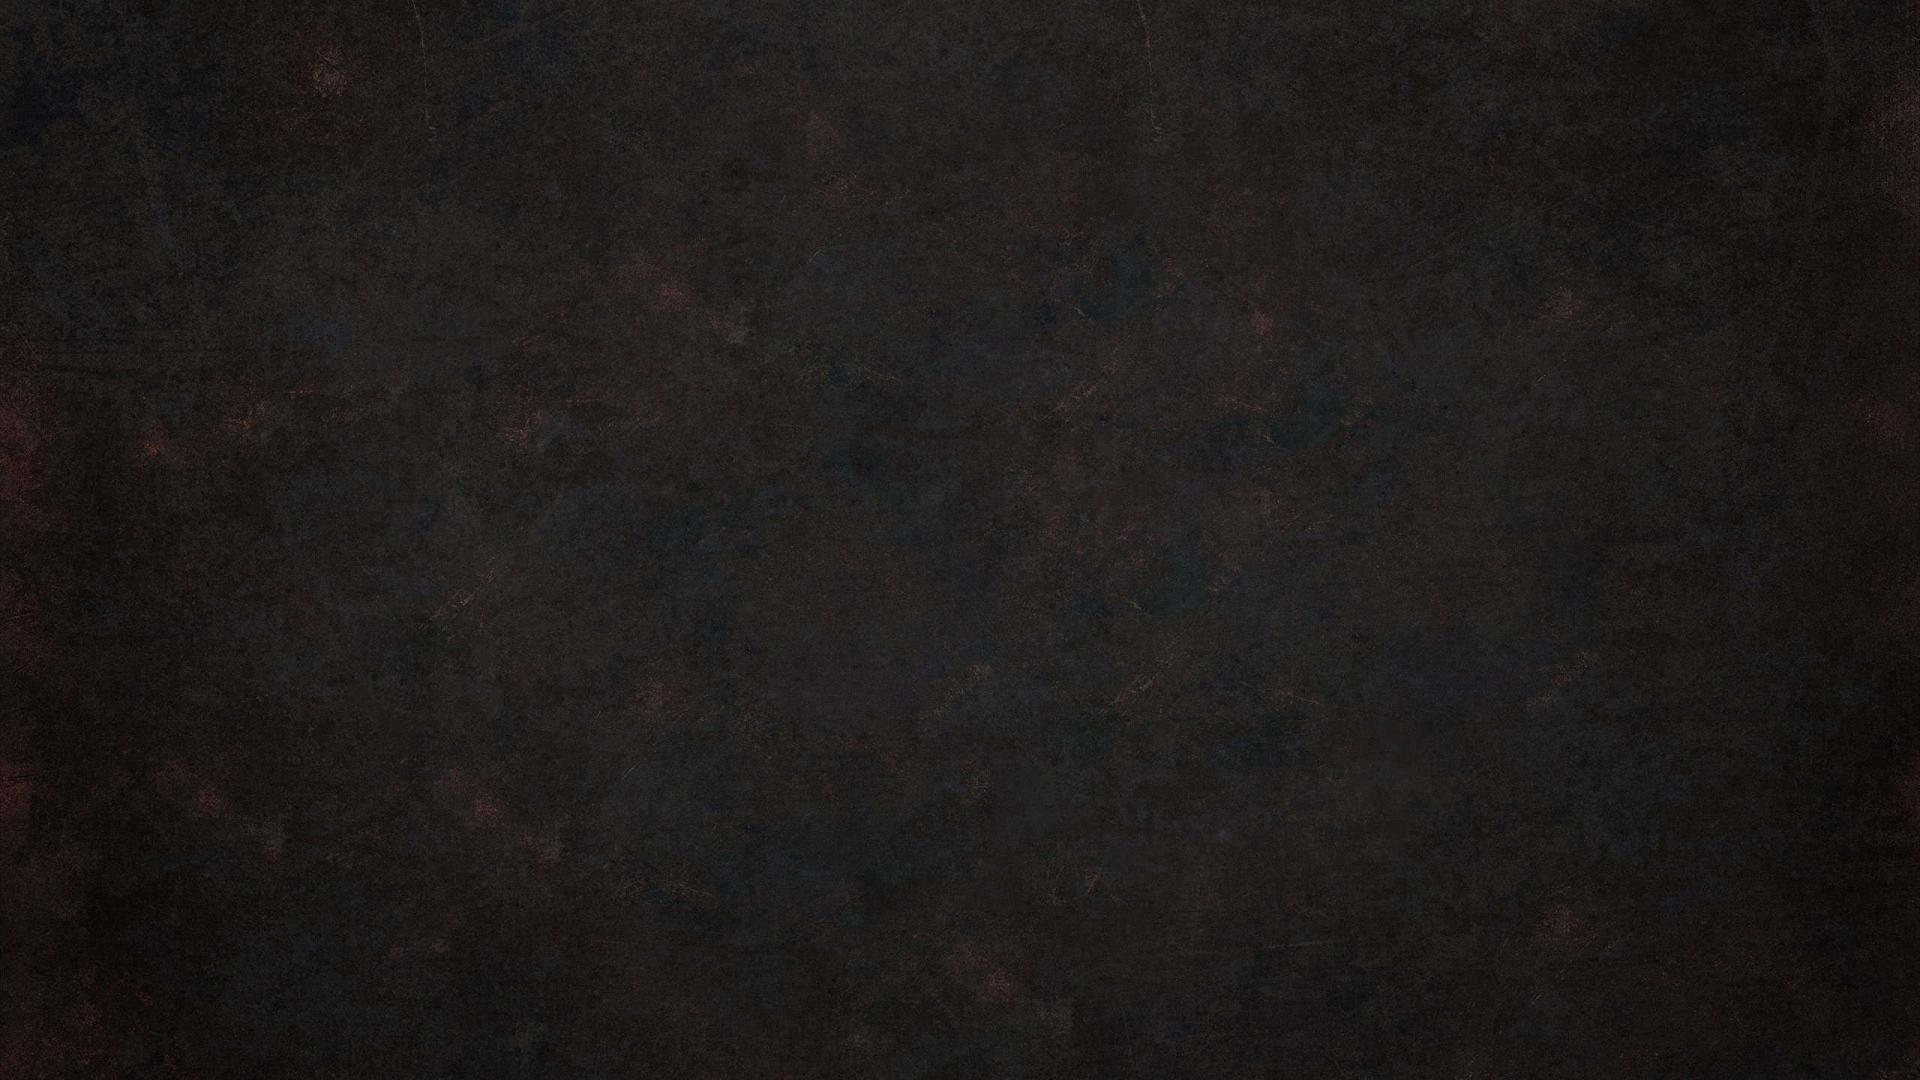 Awesome Fall Wallpapers Black Grunge Wallpaper Pixelstalk Net